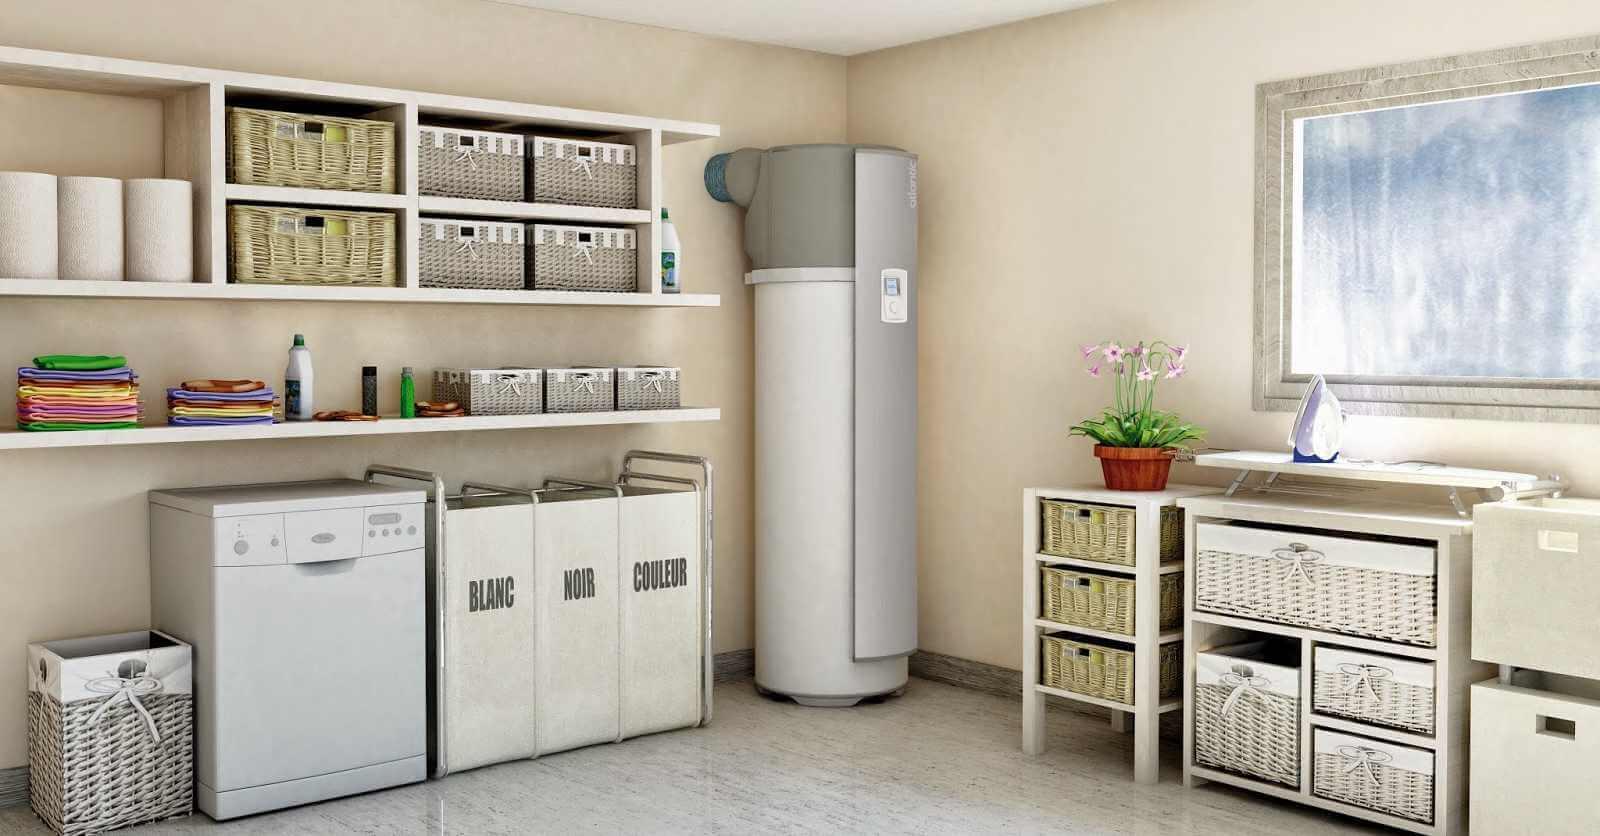 chauffe-eau-thermodynamique-solaire-mb-energies